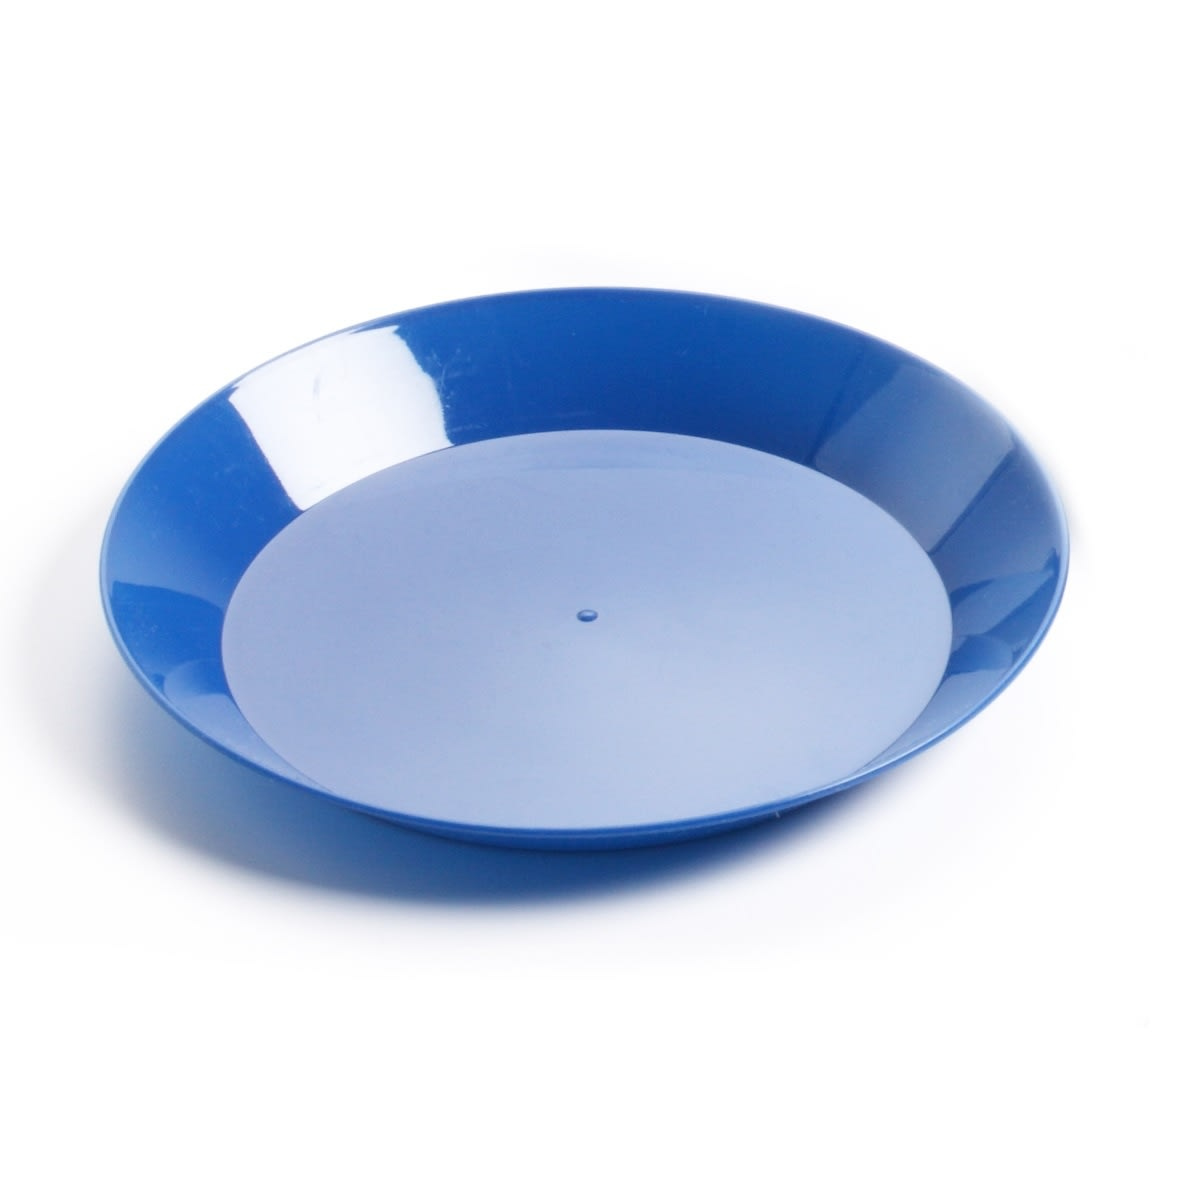 "Coghlan's 9.25"" Plate"